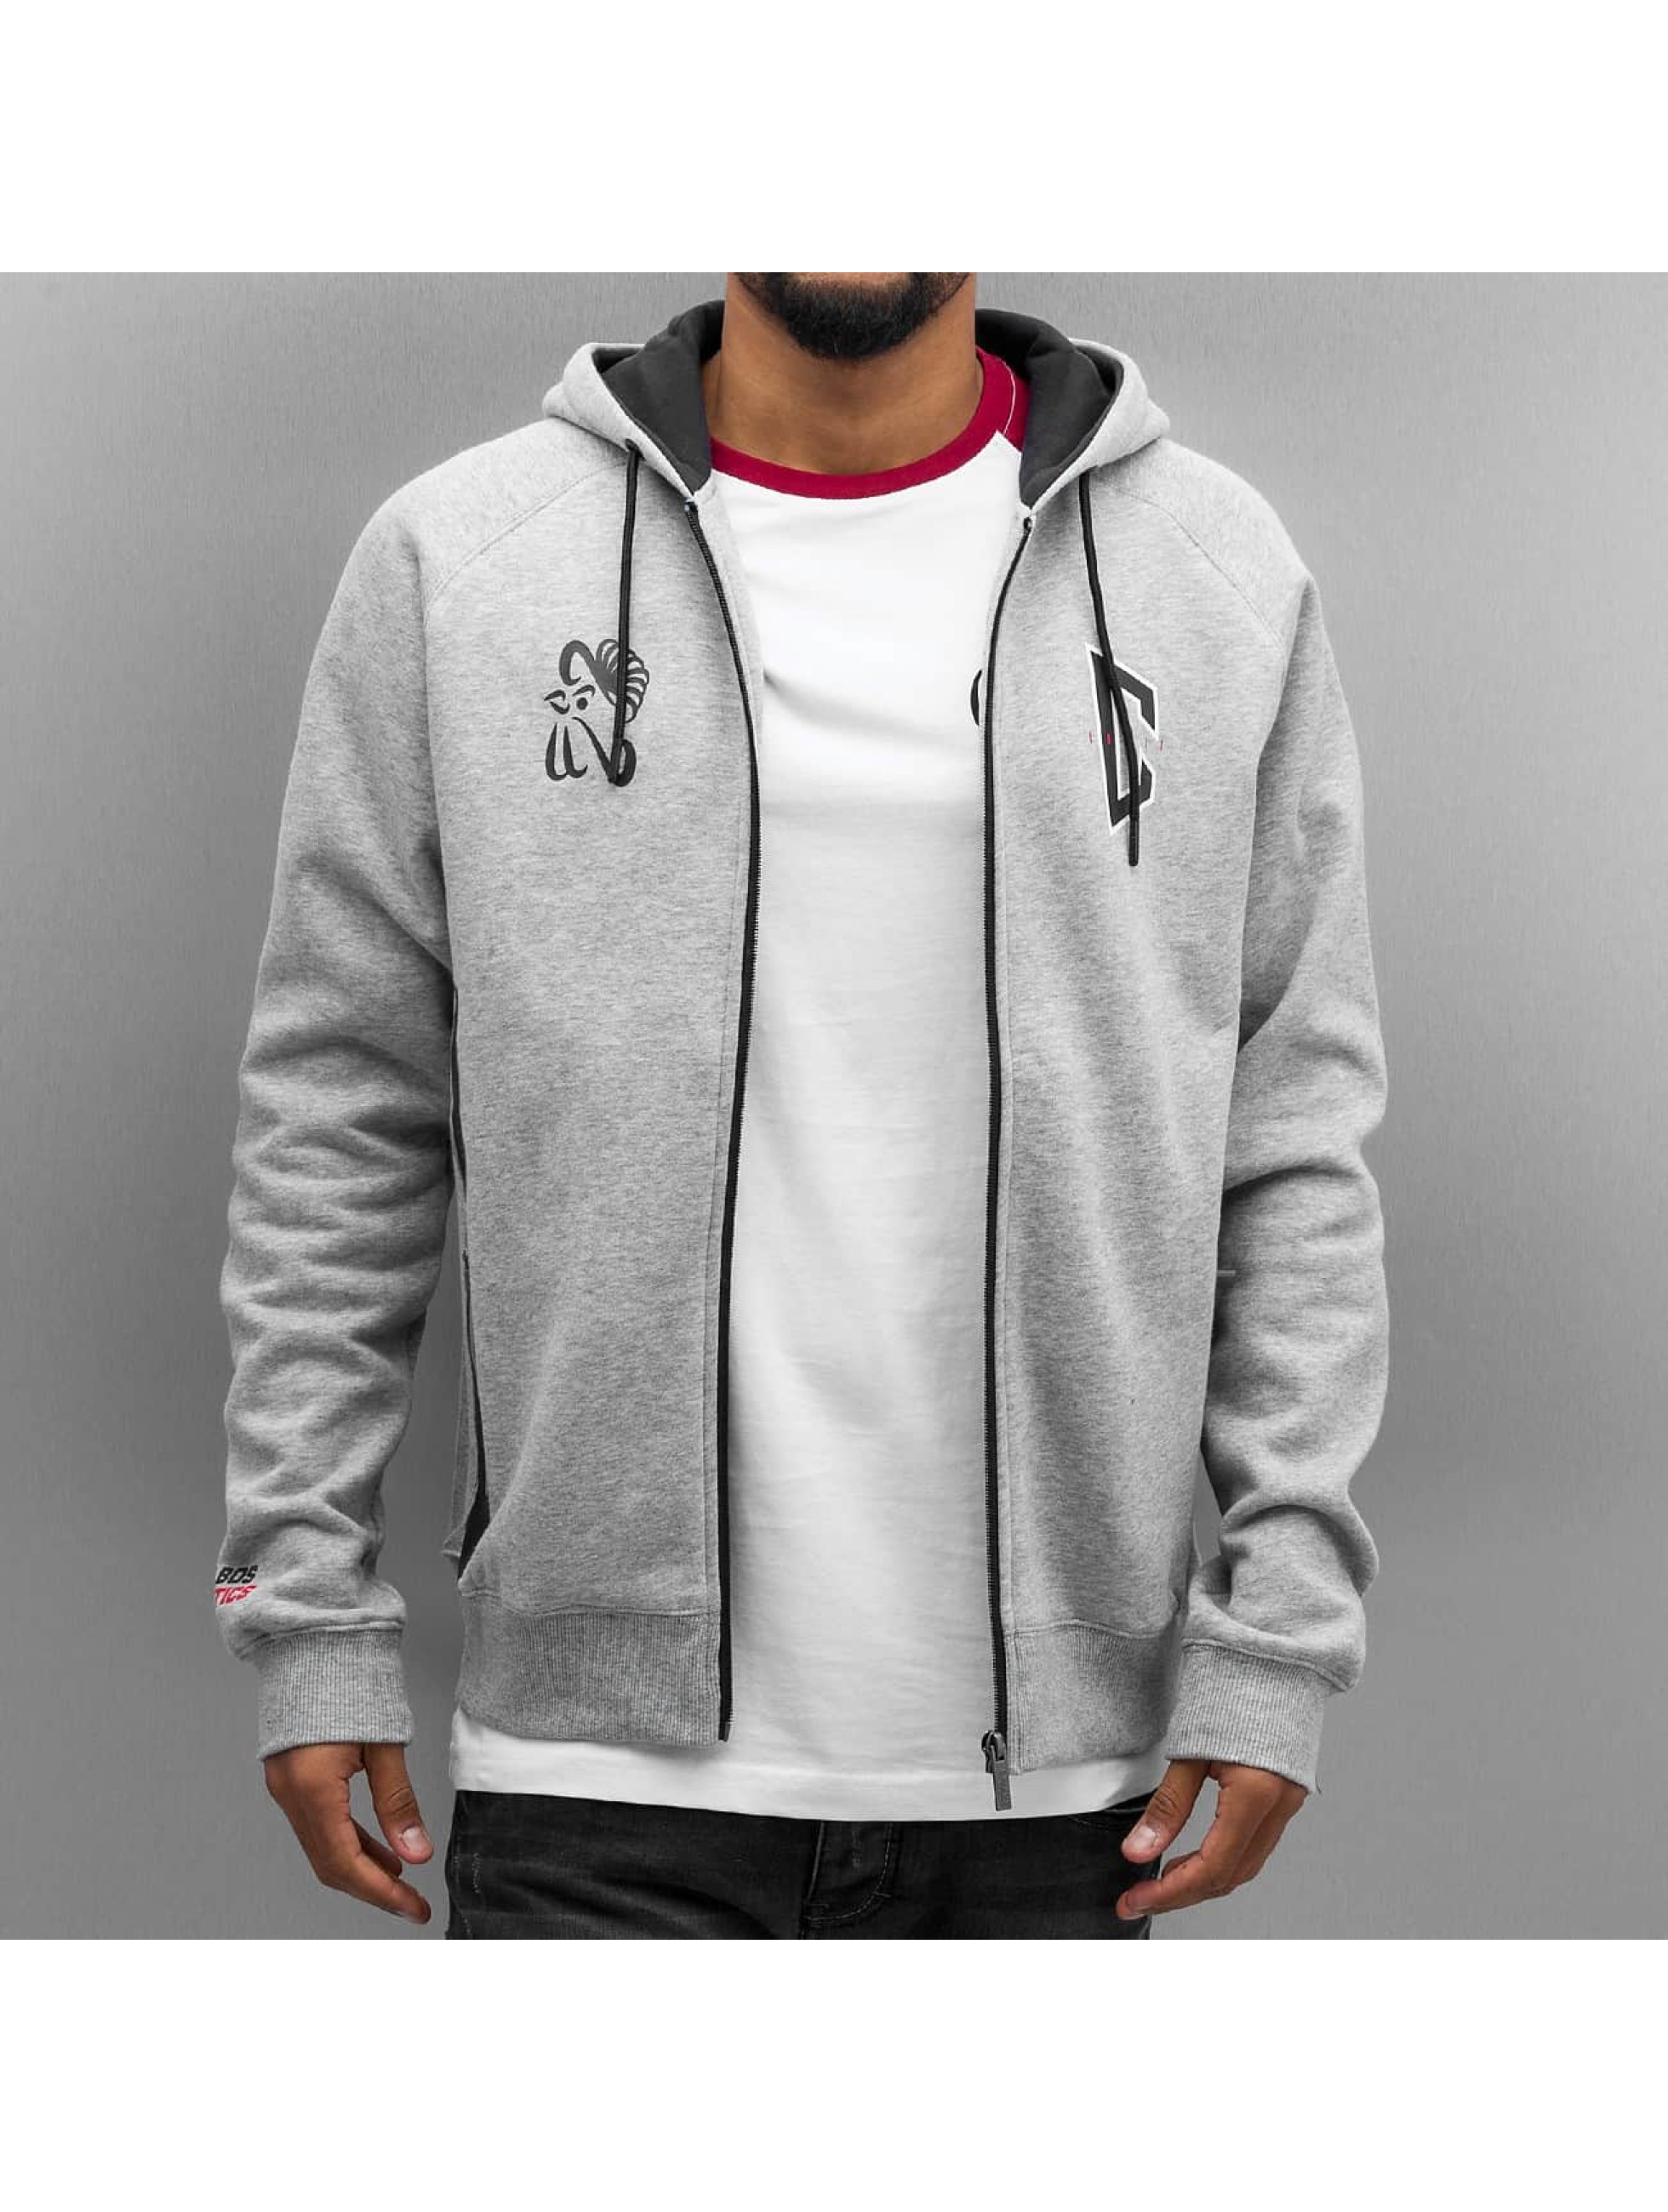 CHABOS IIVII Hoodies con zip Zipper grigio